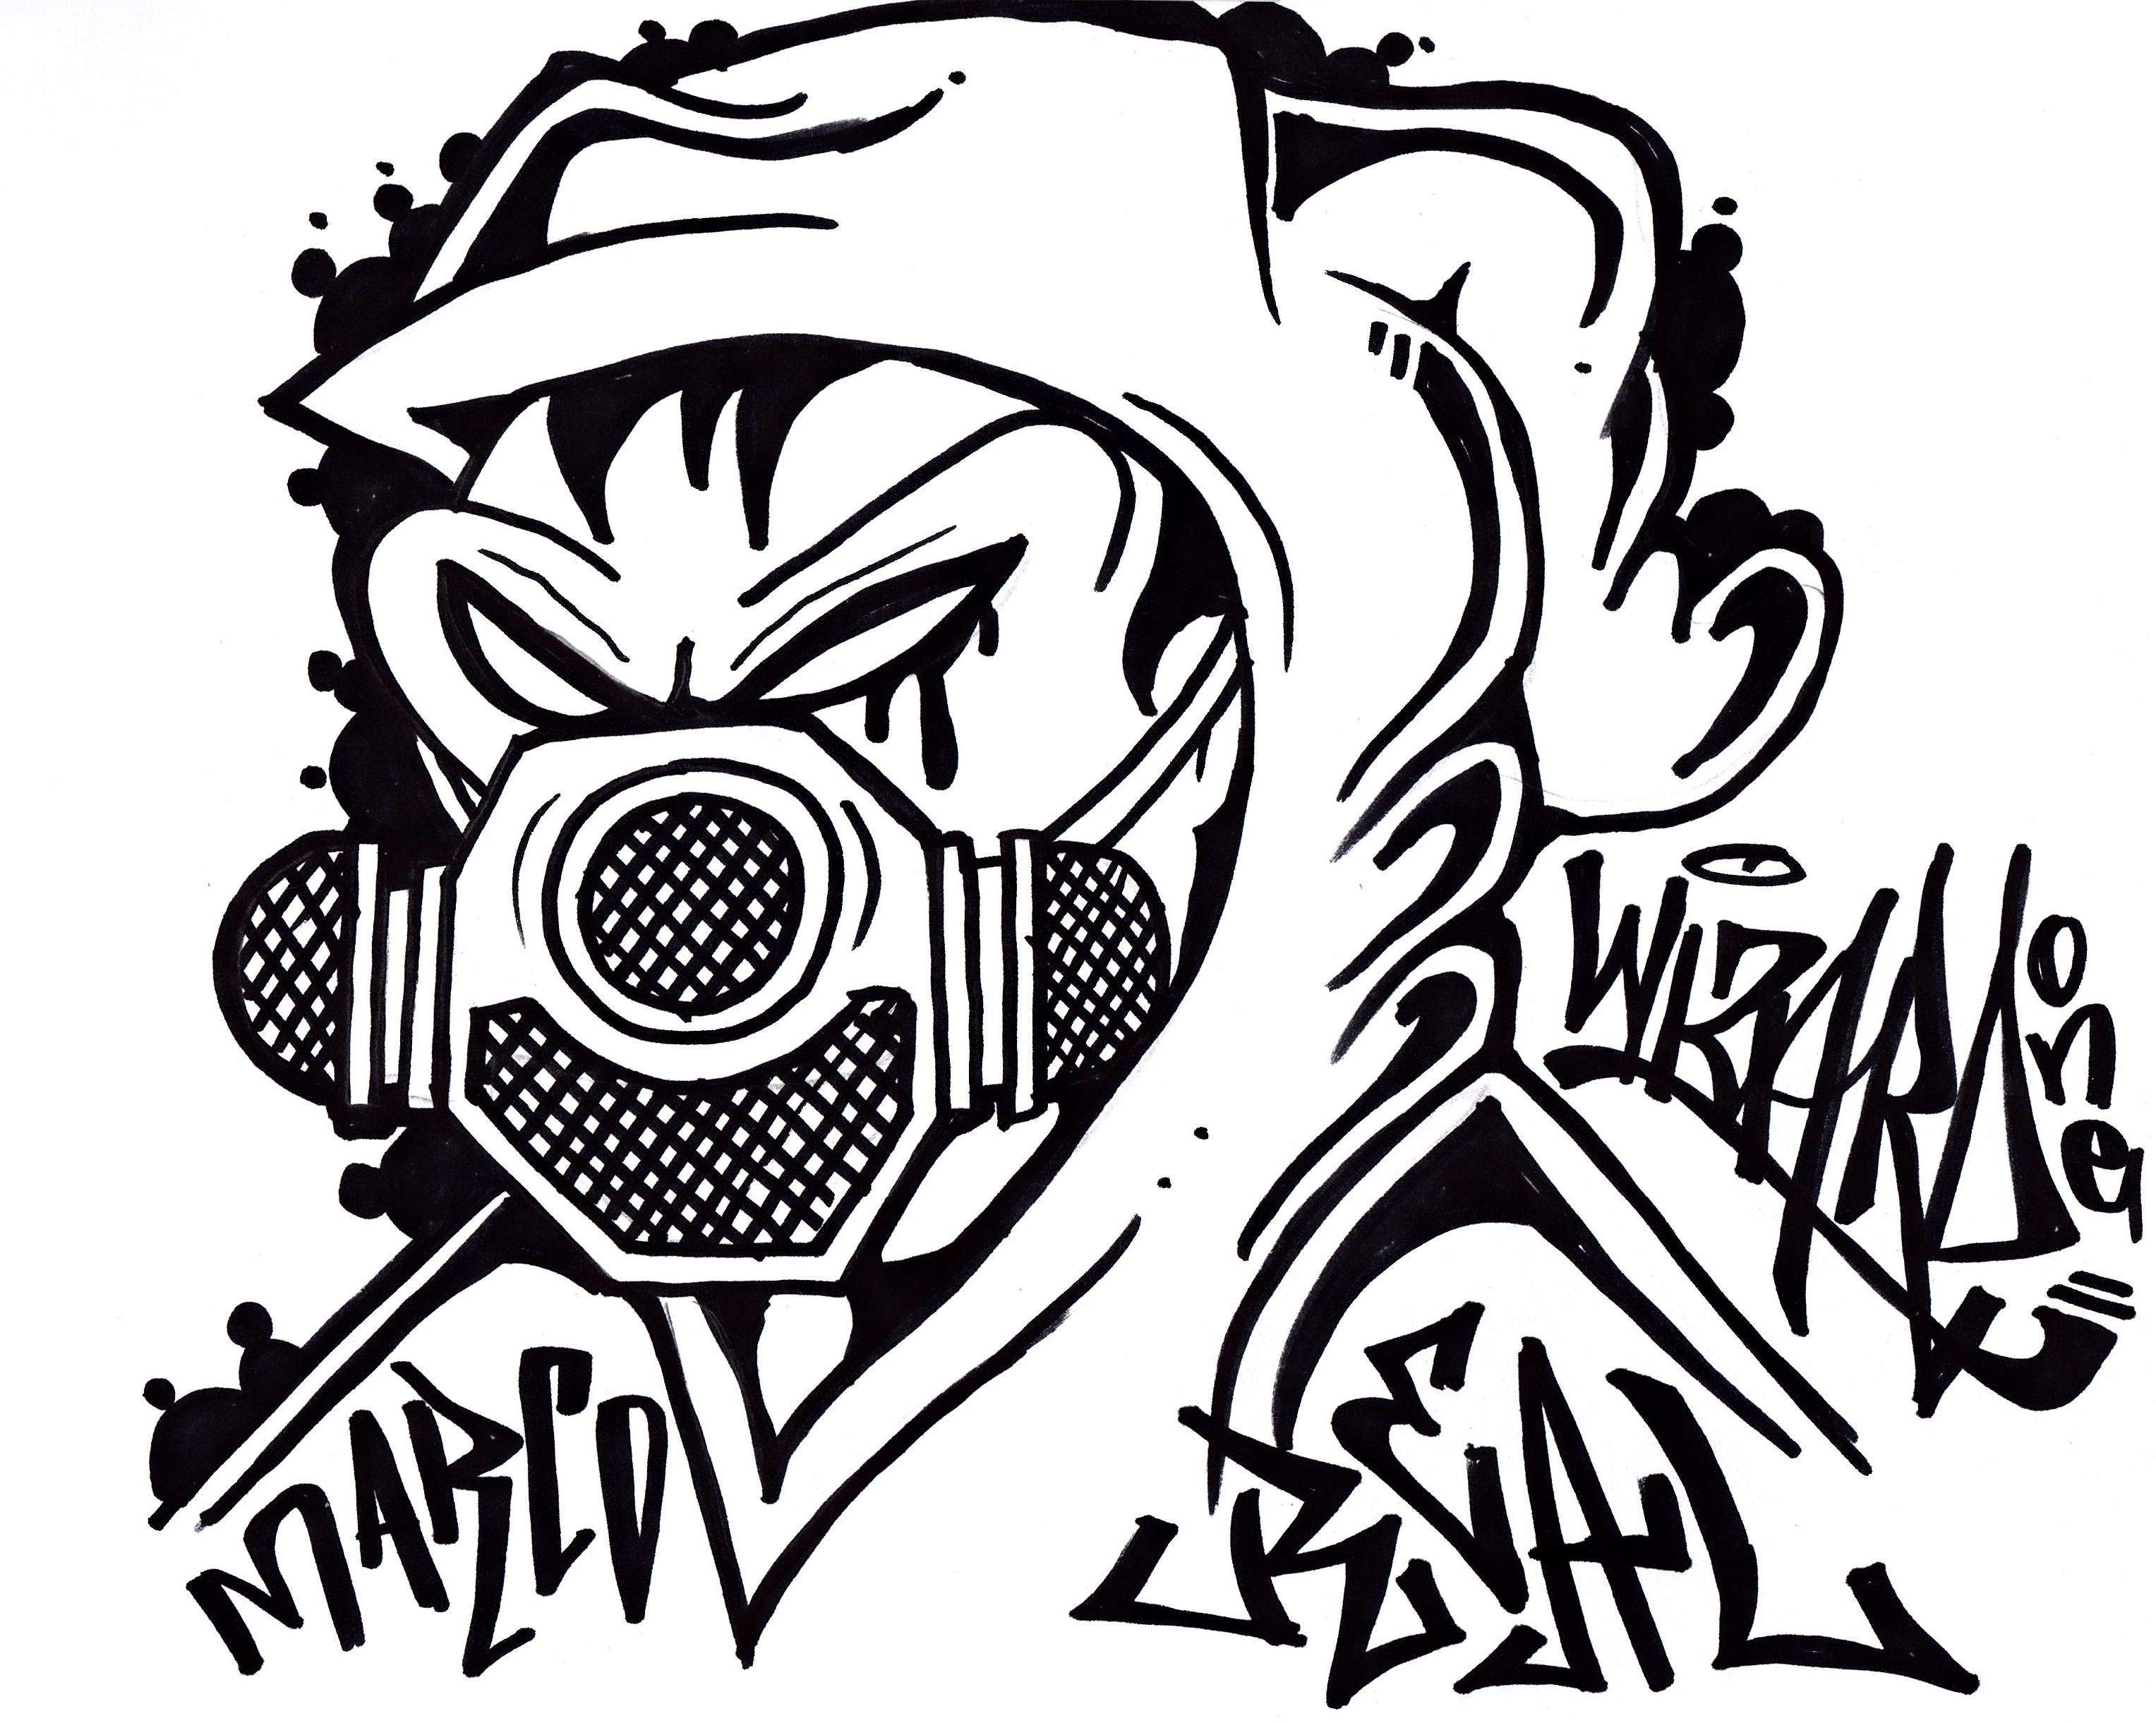 3055x2442 Skull Gas Mask Drawing Gas Mask Creepy